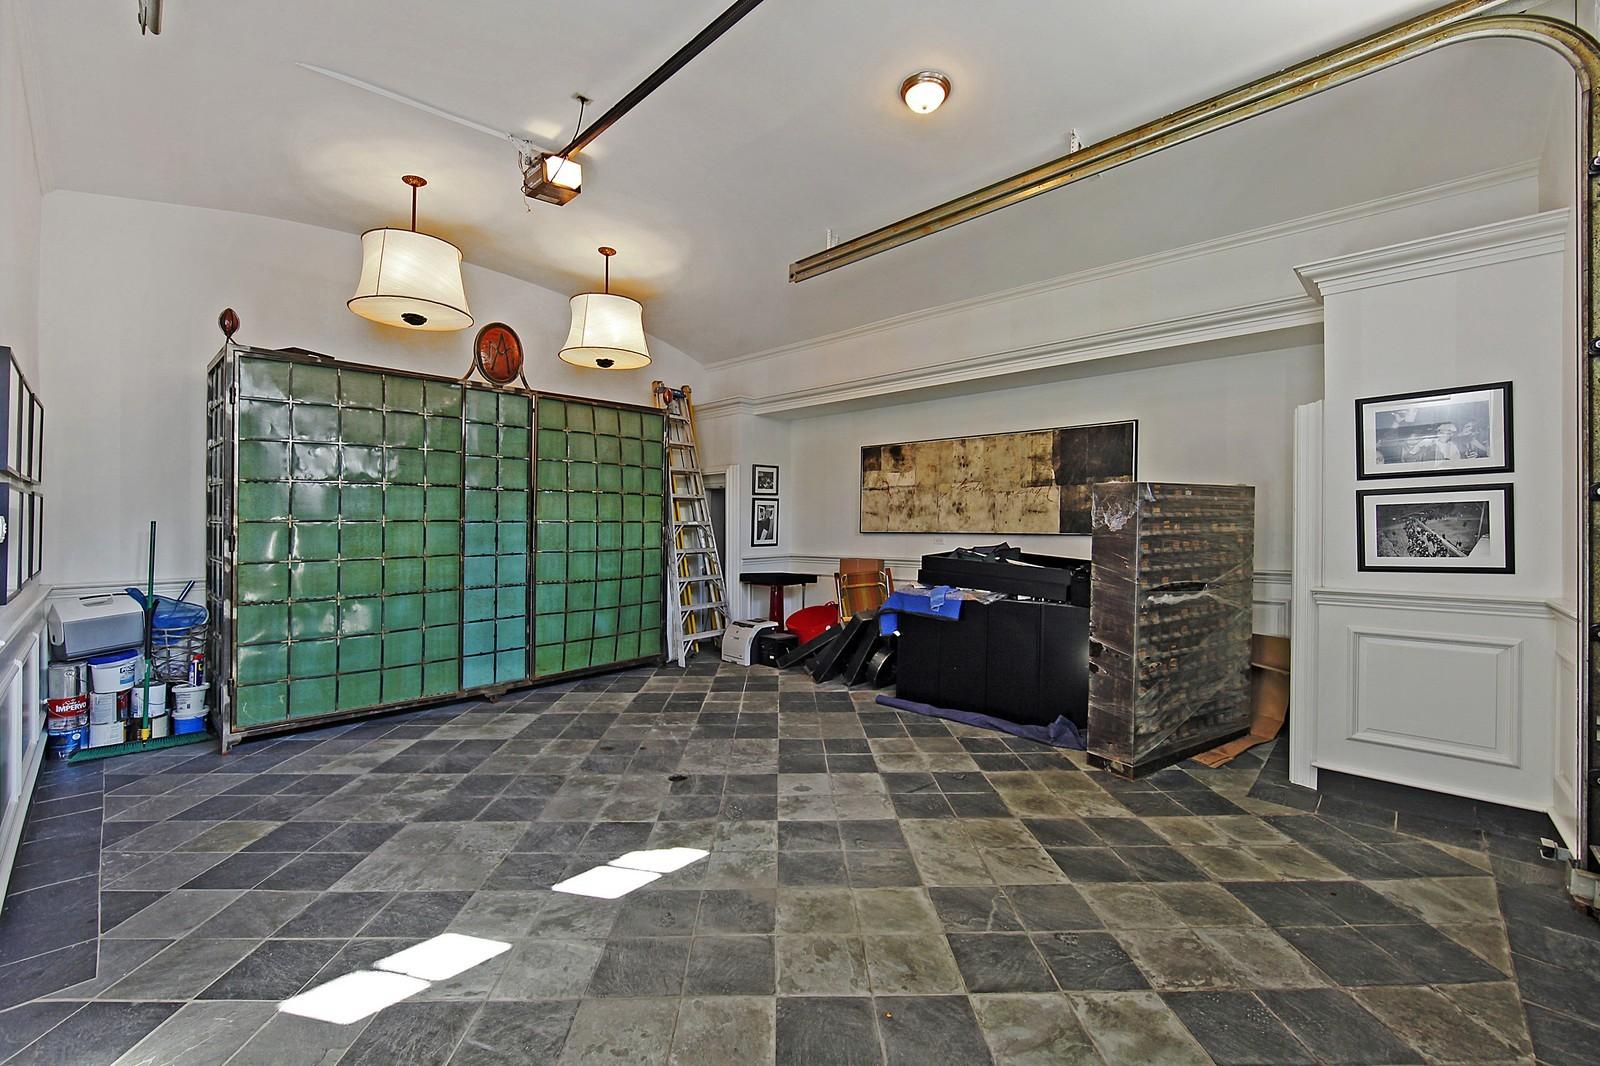 Real Estate Photography - 1424 W Ohio St, Chicago, IL, 60622 - Garage